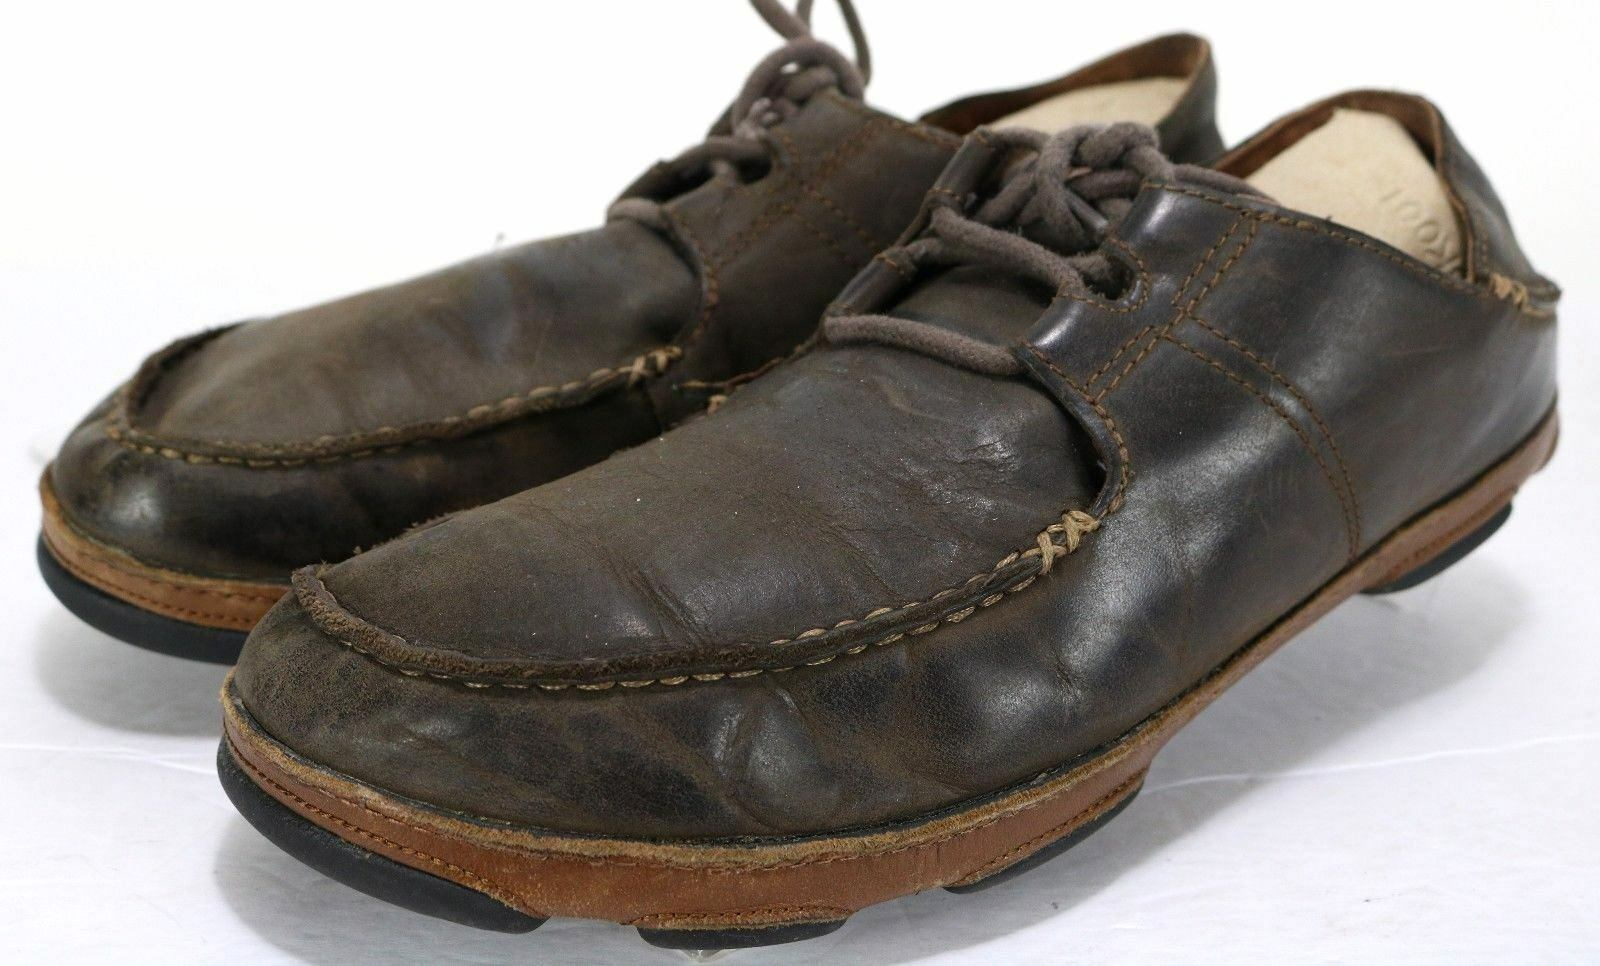 Olukai Ohana  110 Men's Casual shoes Size 10 Leather Brown